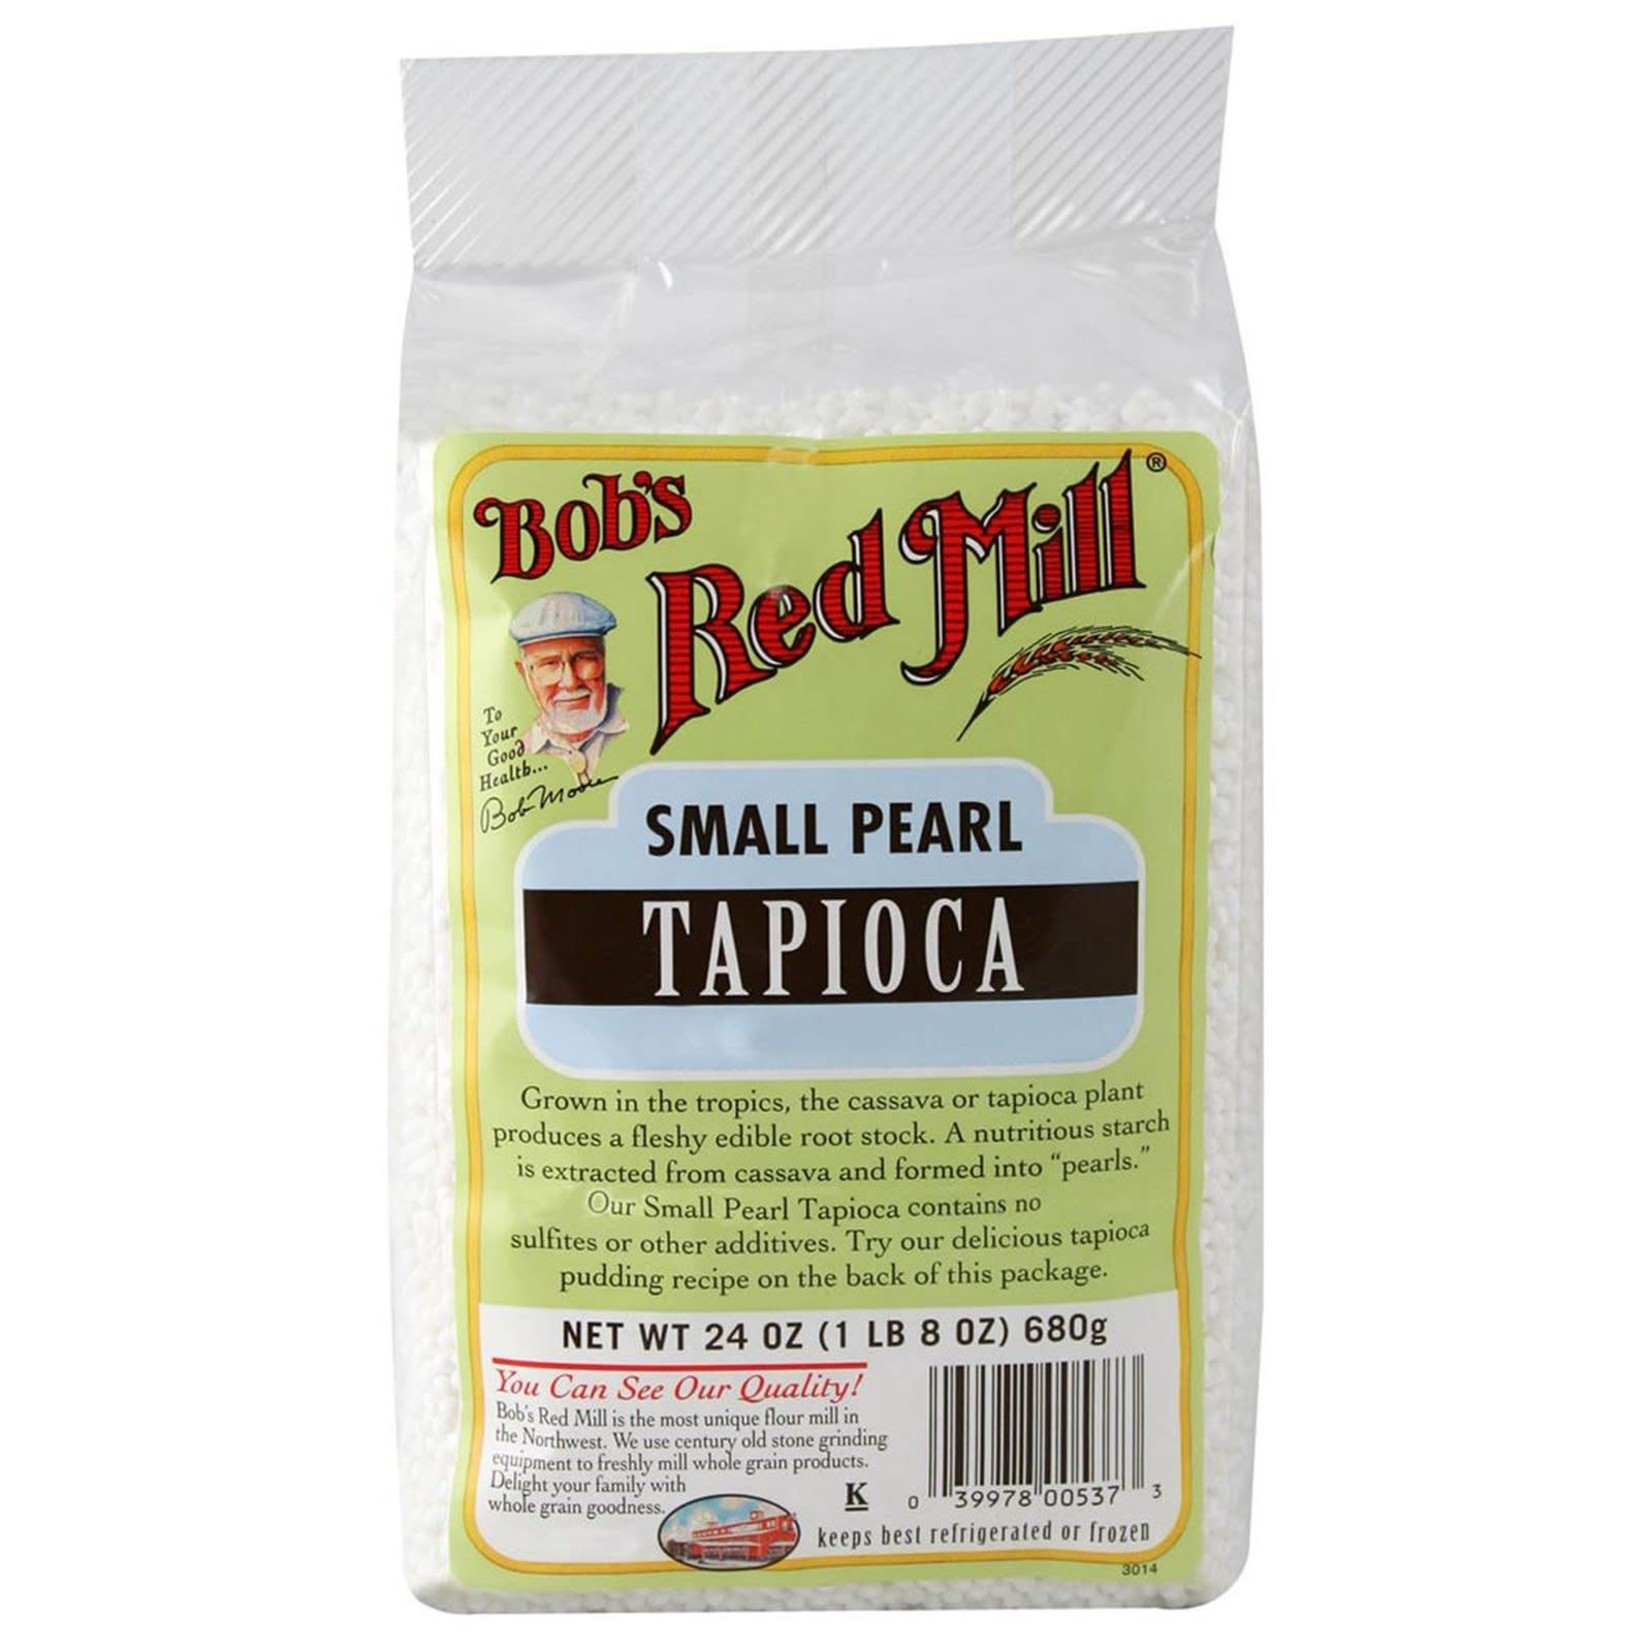 Bob's Red Mill Bob's Red Mill Small Pearl Tapioca 680g